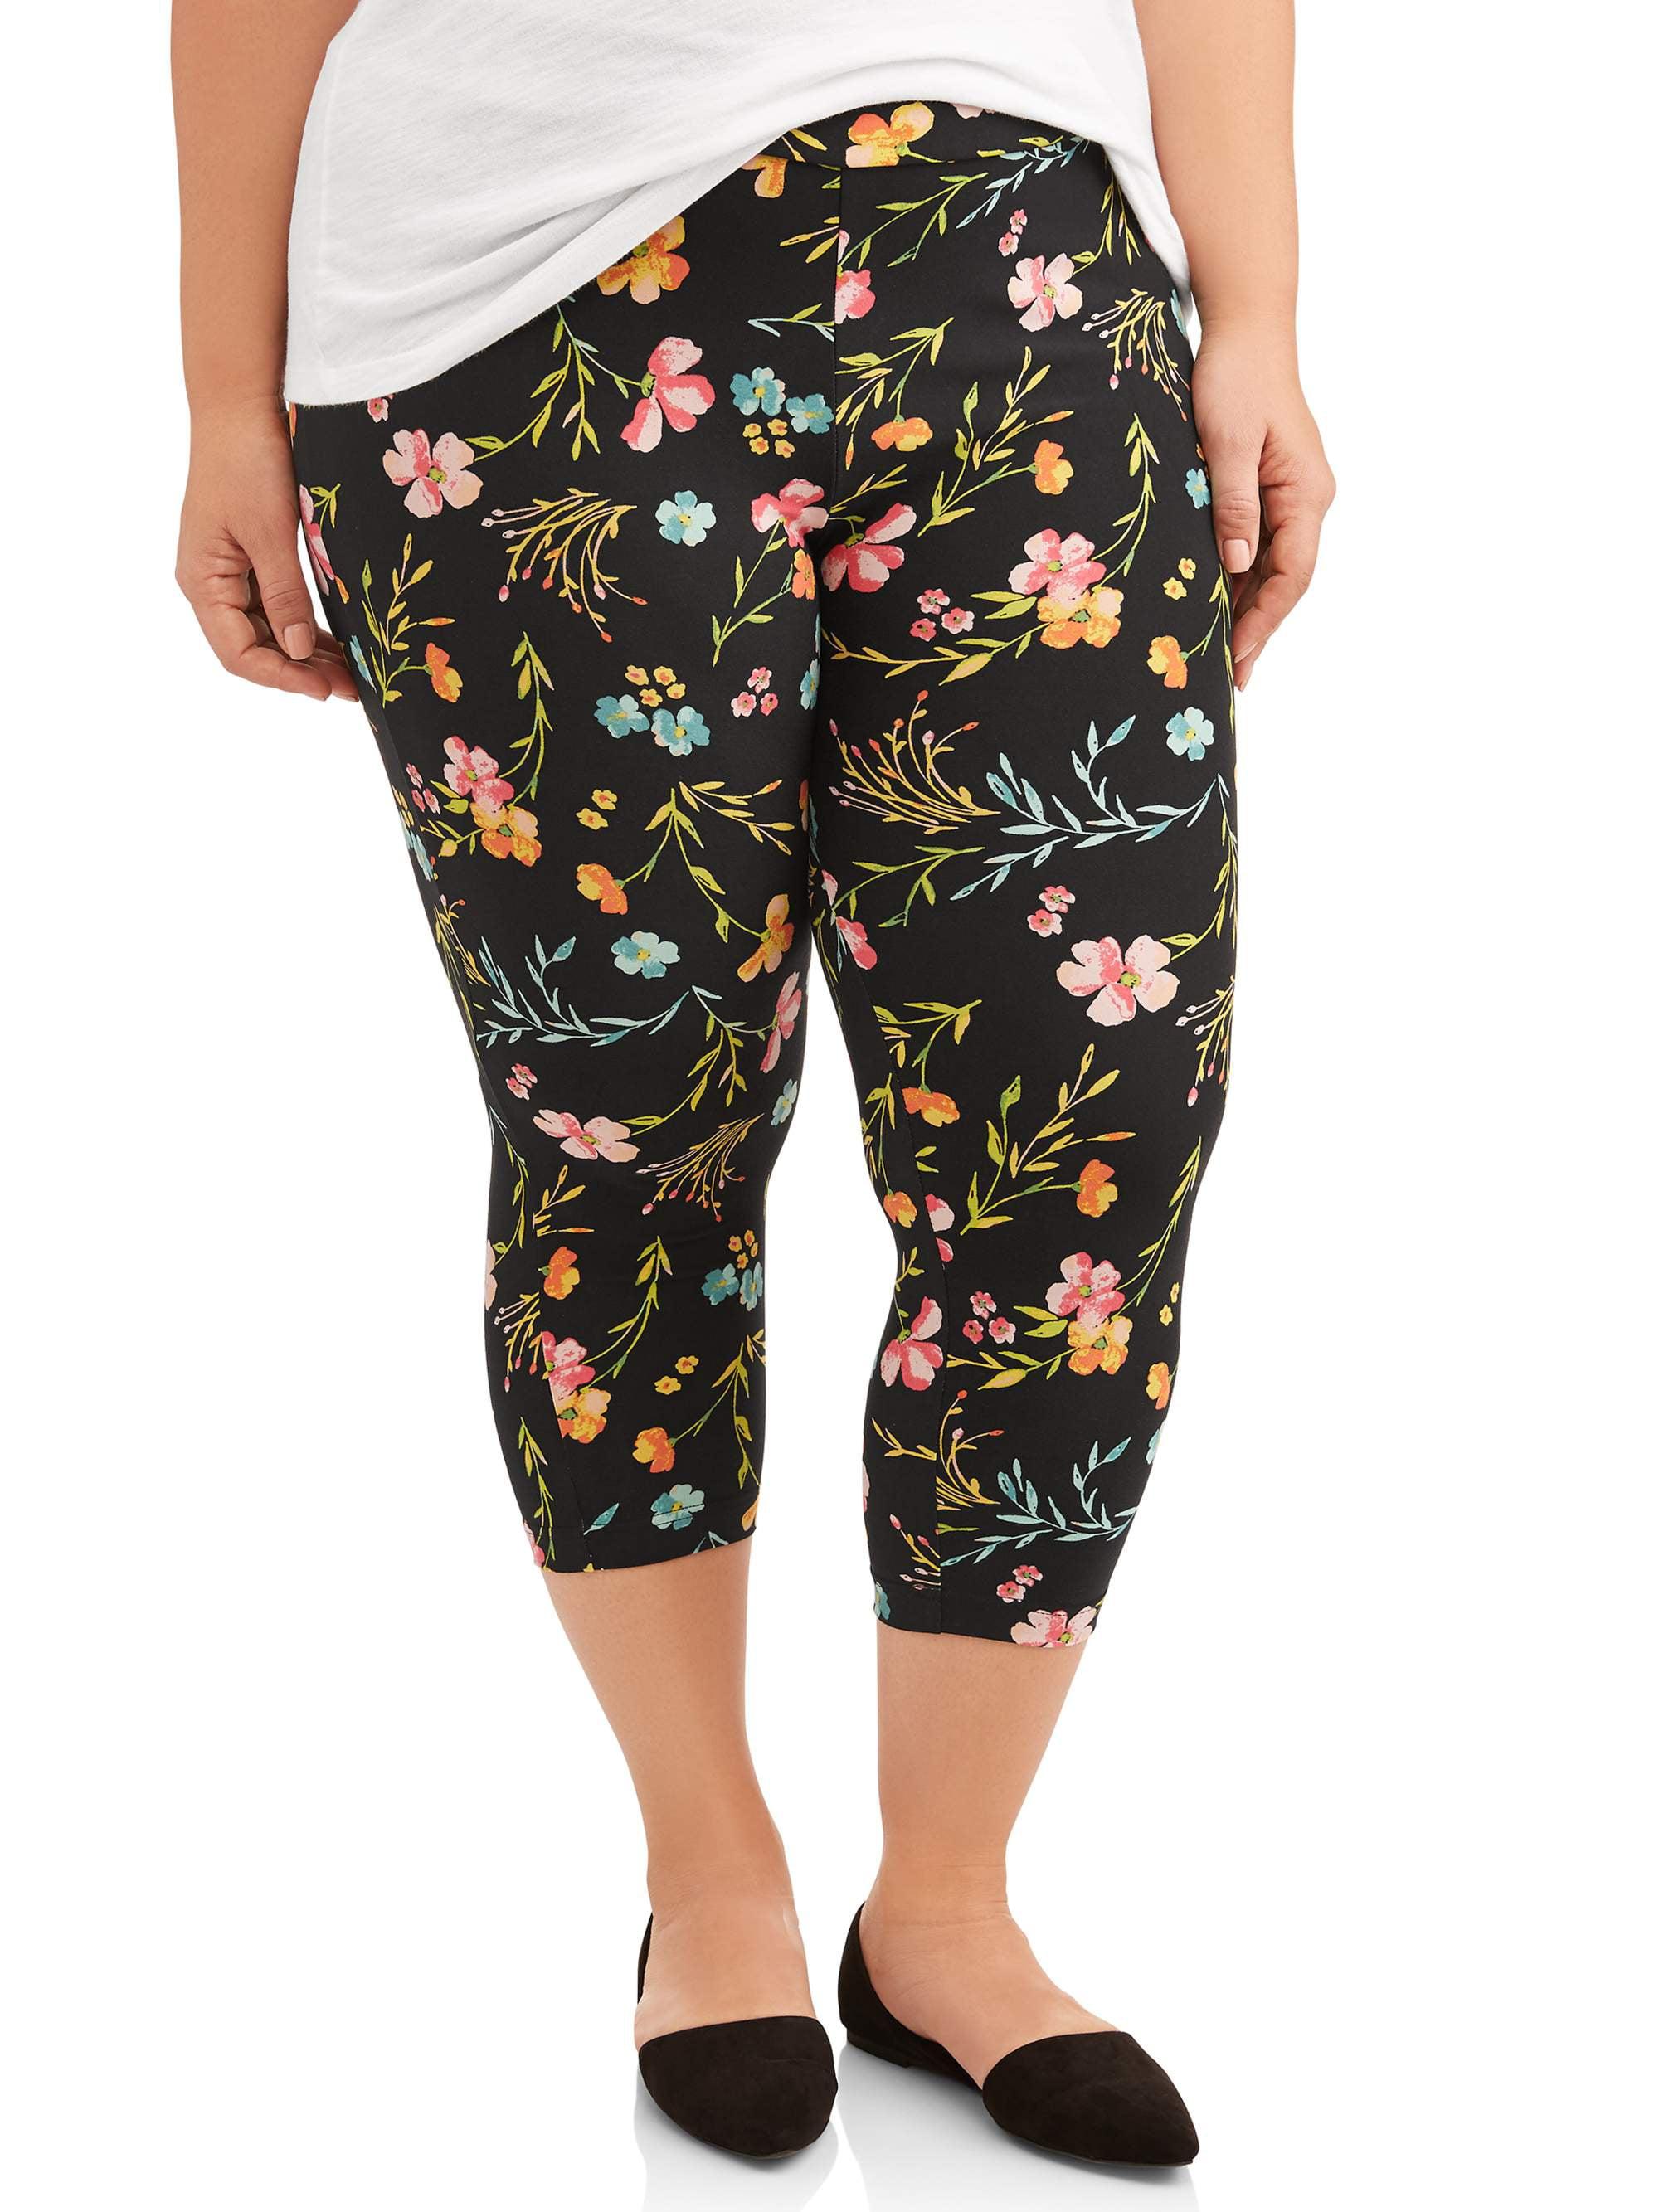 5757c0fa2d30e3 Terra & Sky - Women's Plus Size Super Soft Printed Capri Legging ...